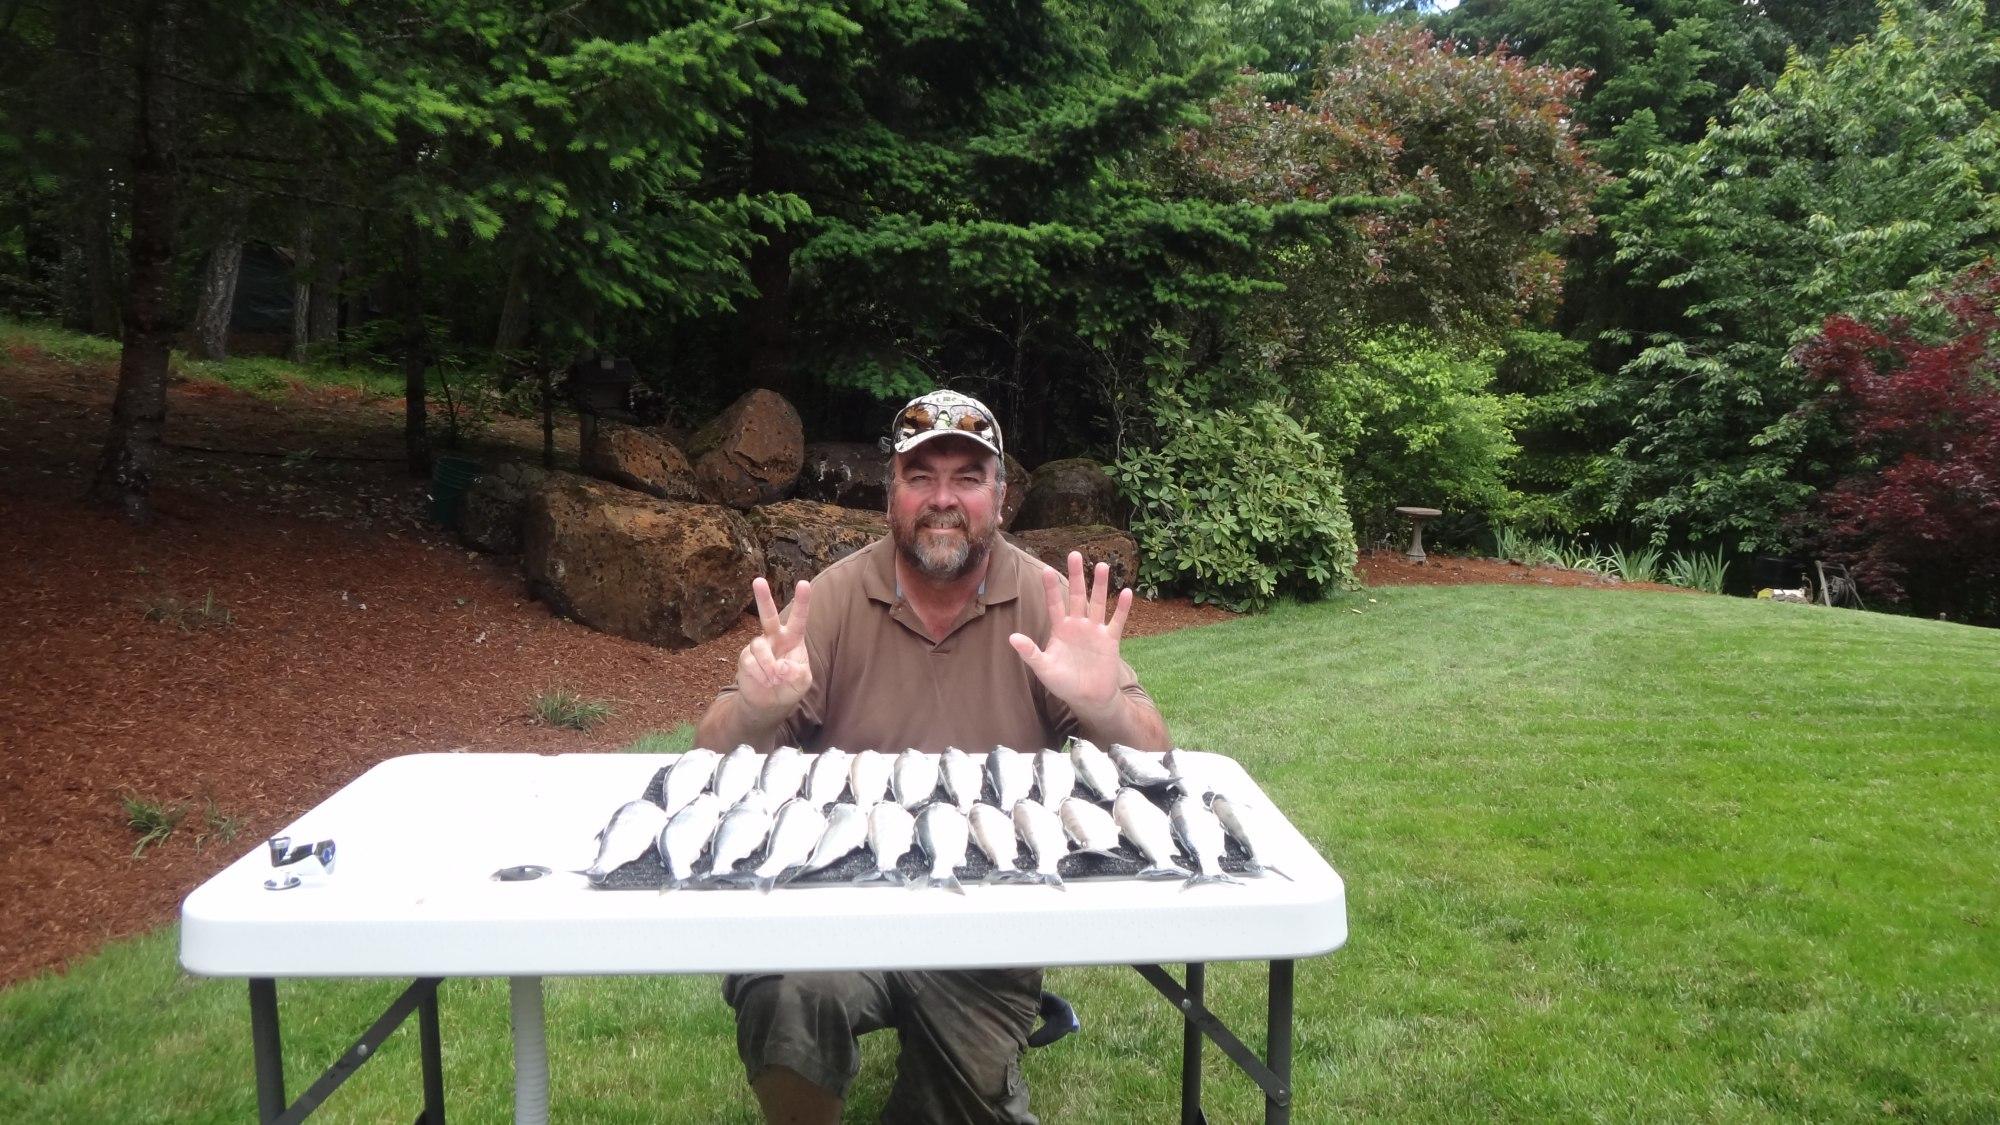 Angler Brad Halleck Fish of the Week June 1, 2013